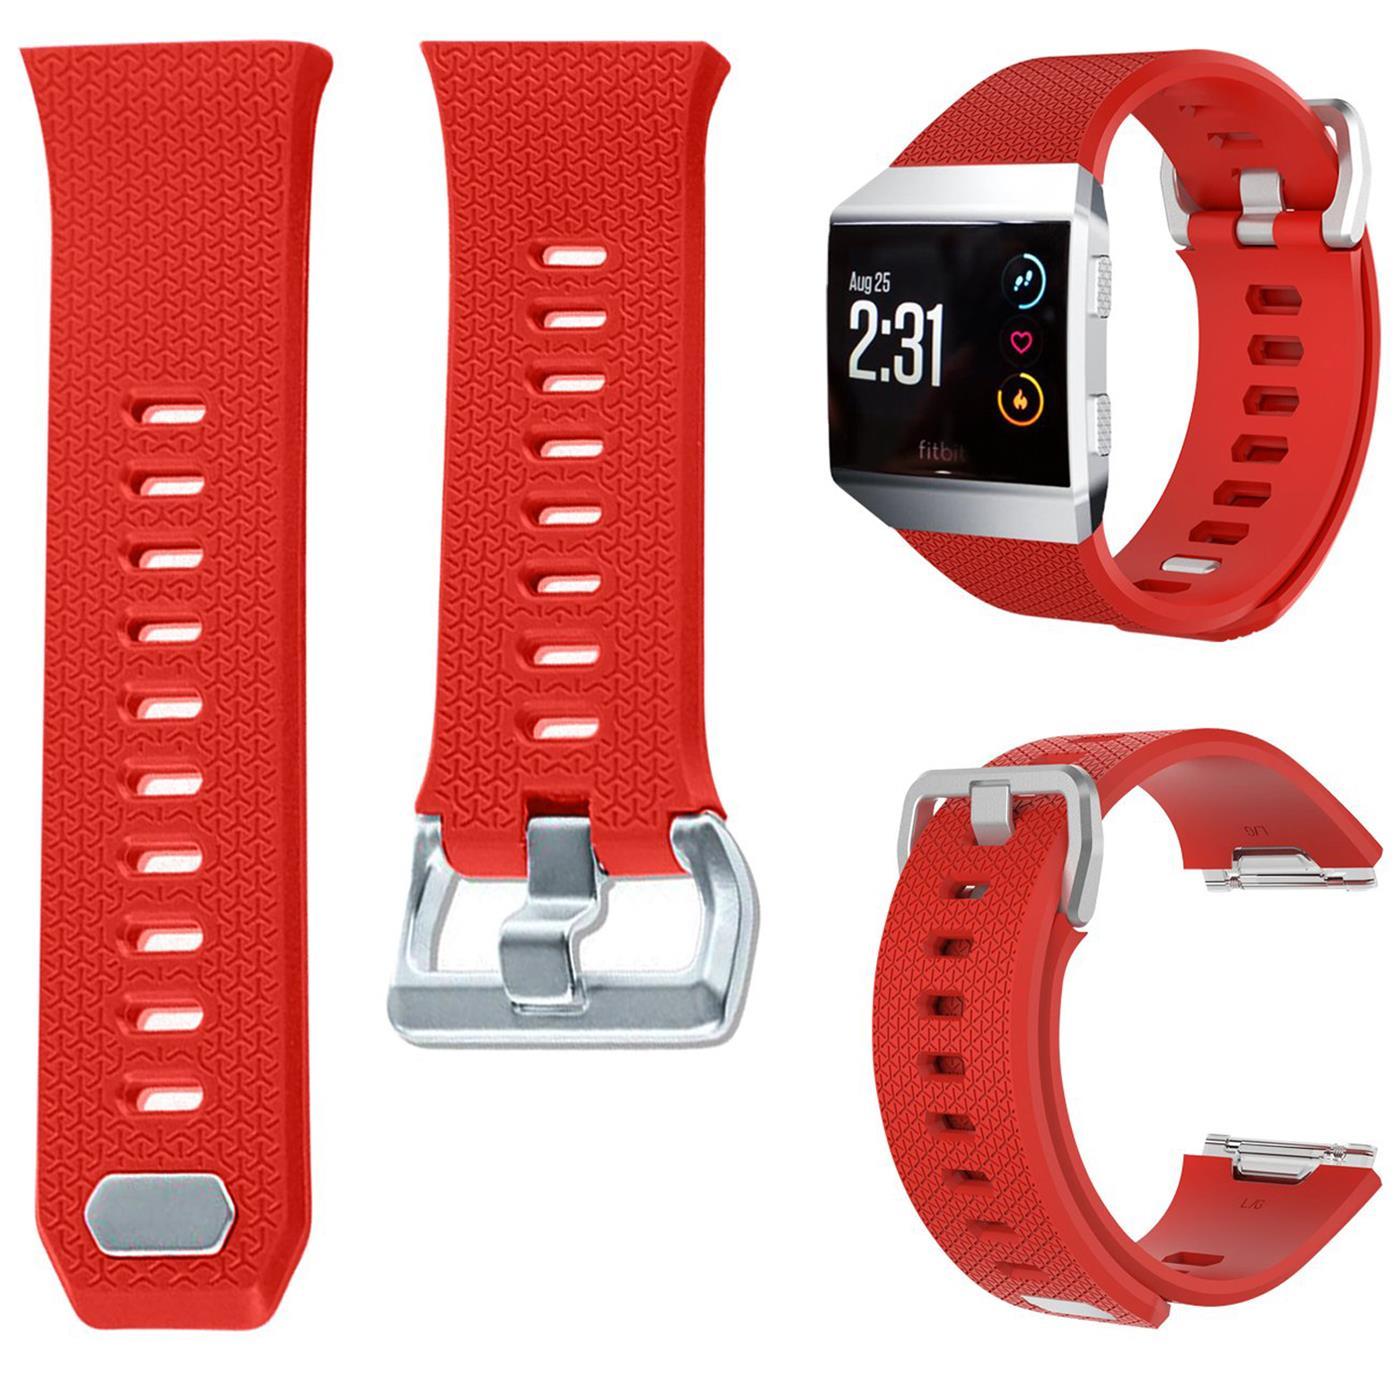 Fitbit-Groesse-S-oder-L-Ersatz-Silikon-Armband-Uhren-Sport-Band-Fitness-Tracker Indexbild 30